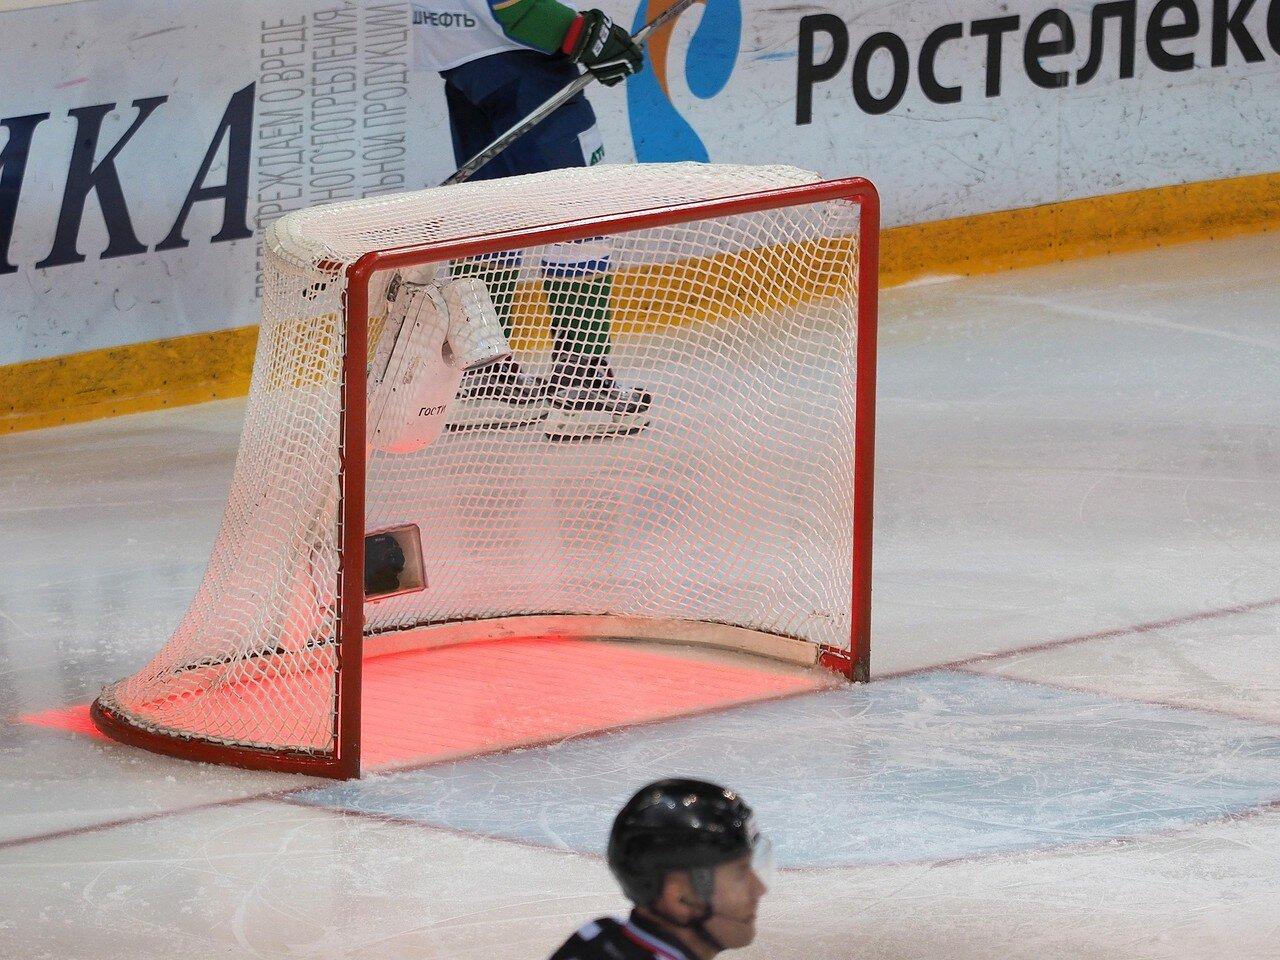 117Плей-офф 2016 Восток Финал Металлург - Салават Юлаев 23.03.2016